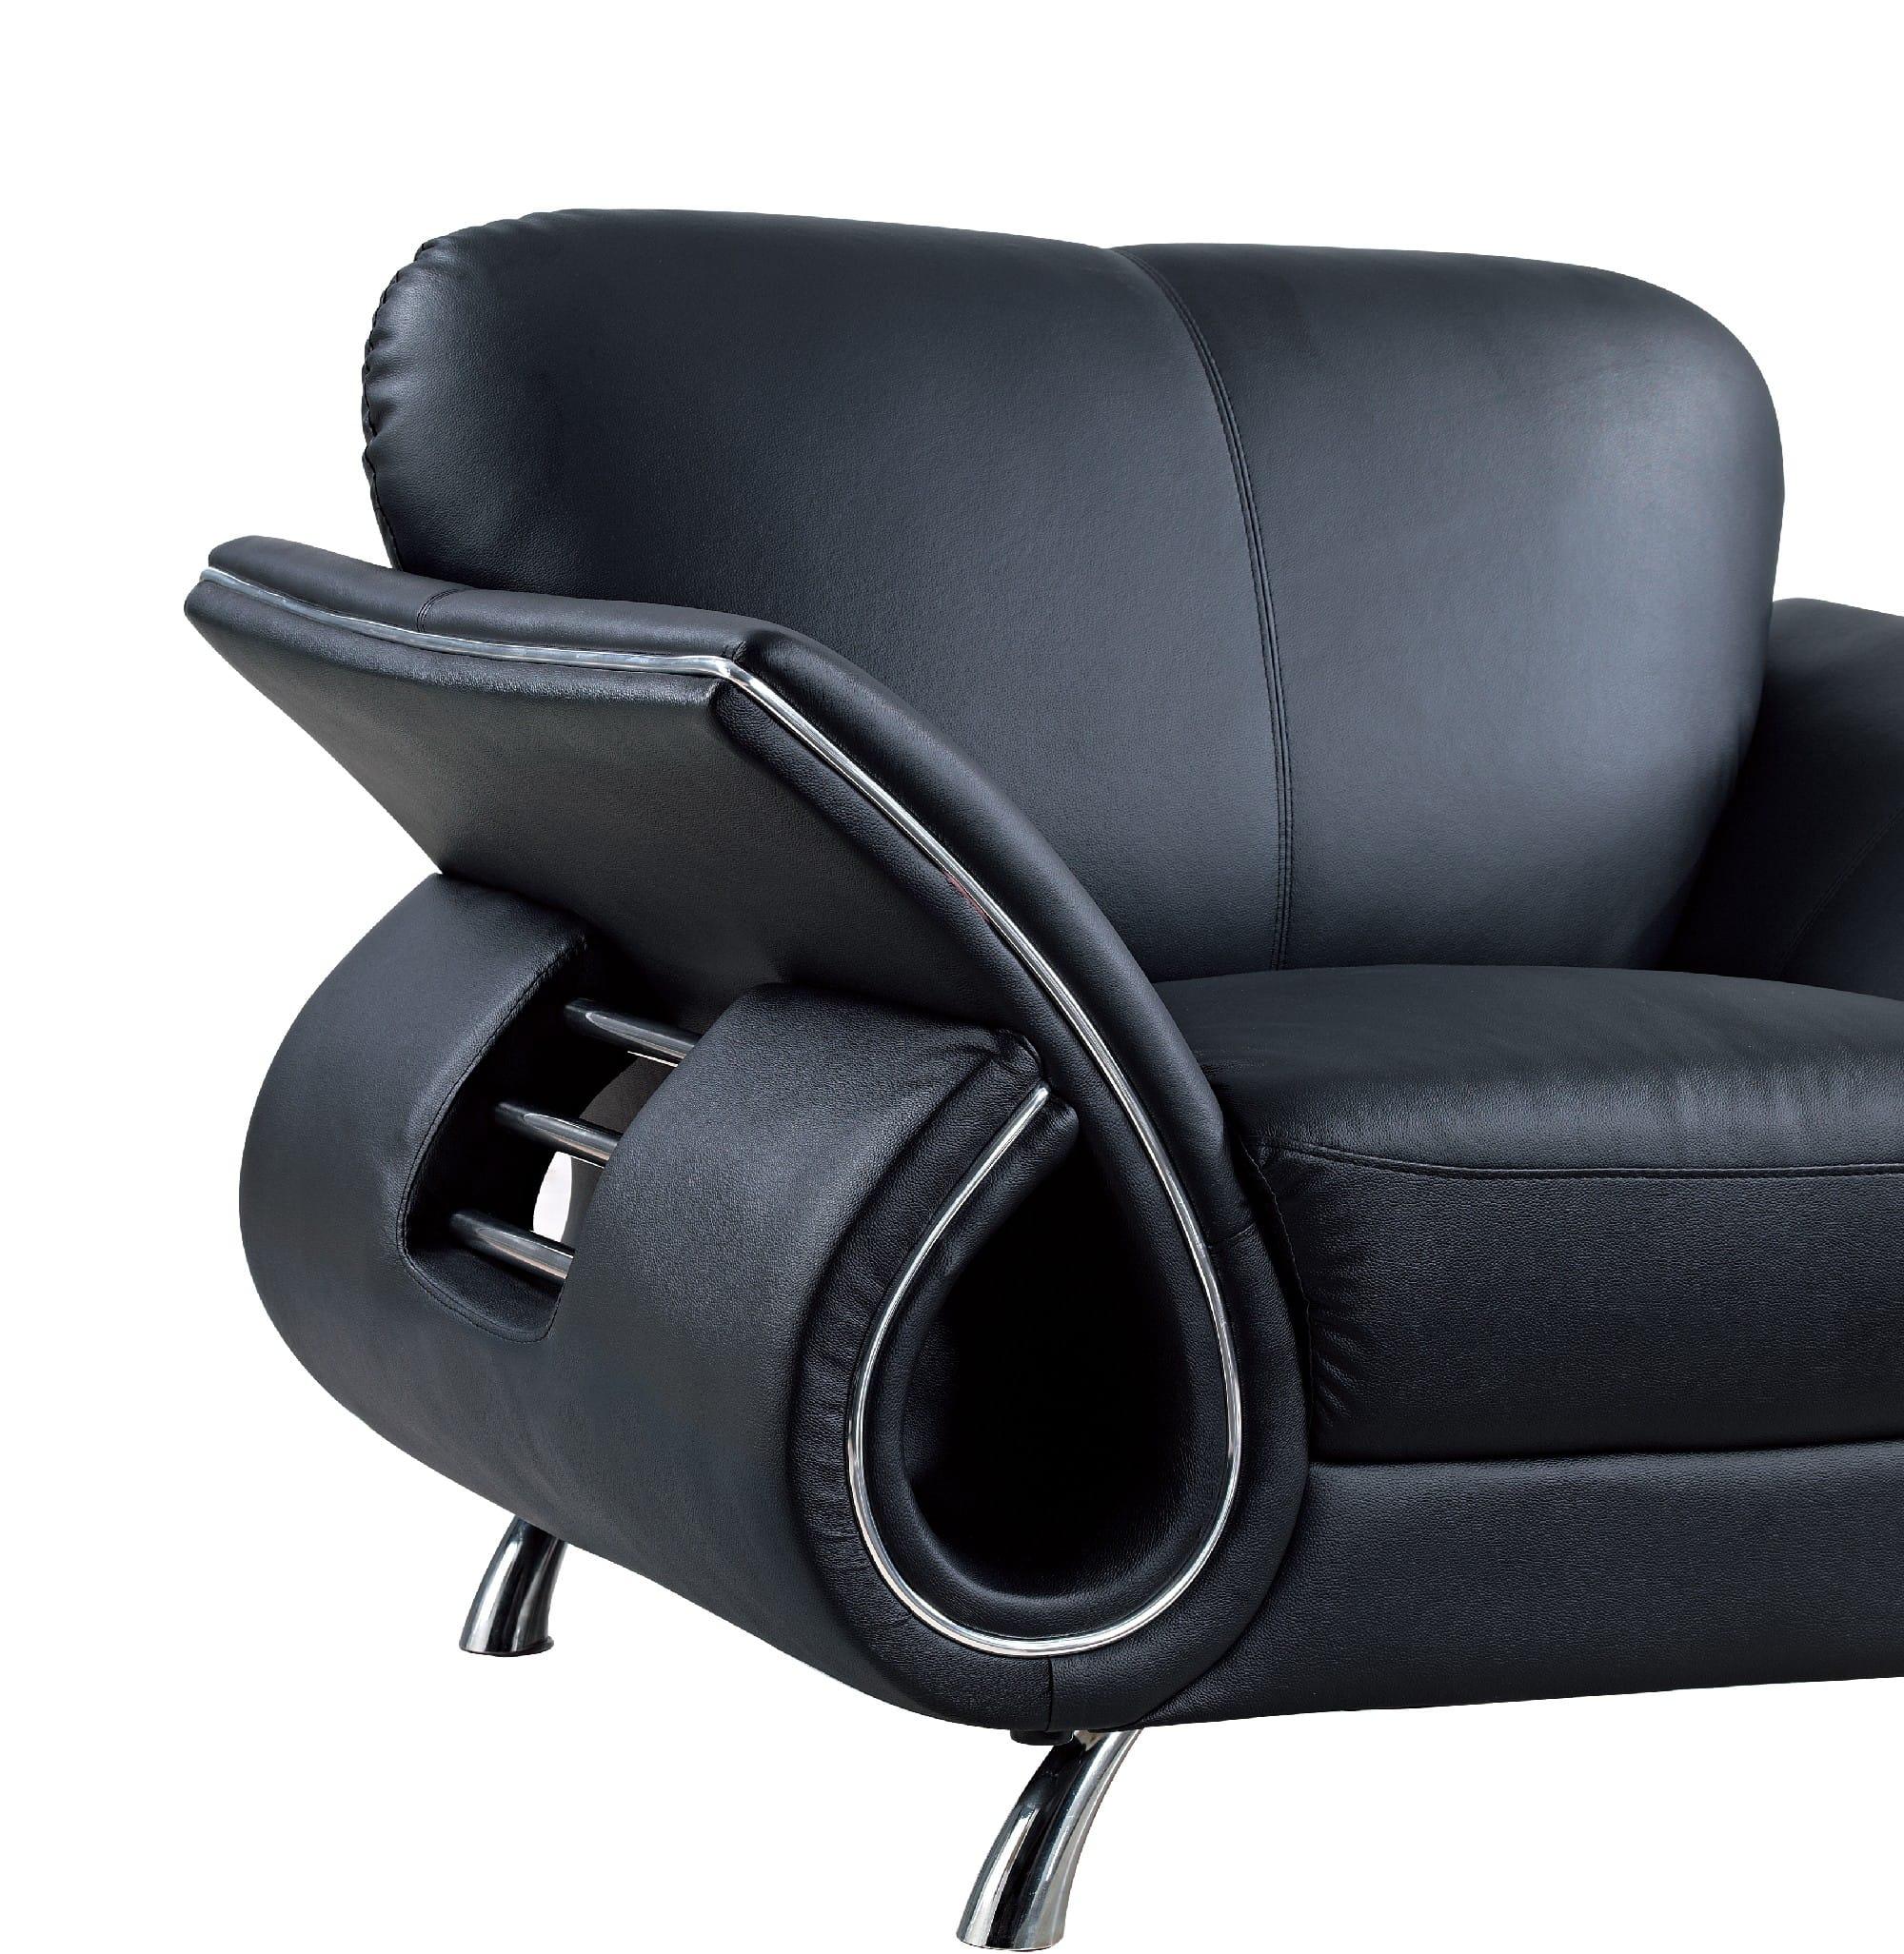 U559 Black Leather Loveseat By Global Furniture